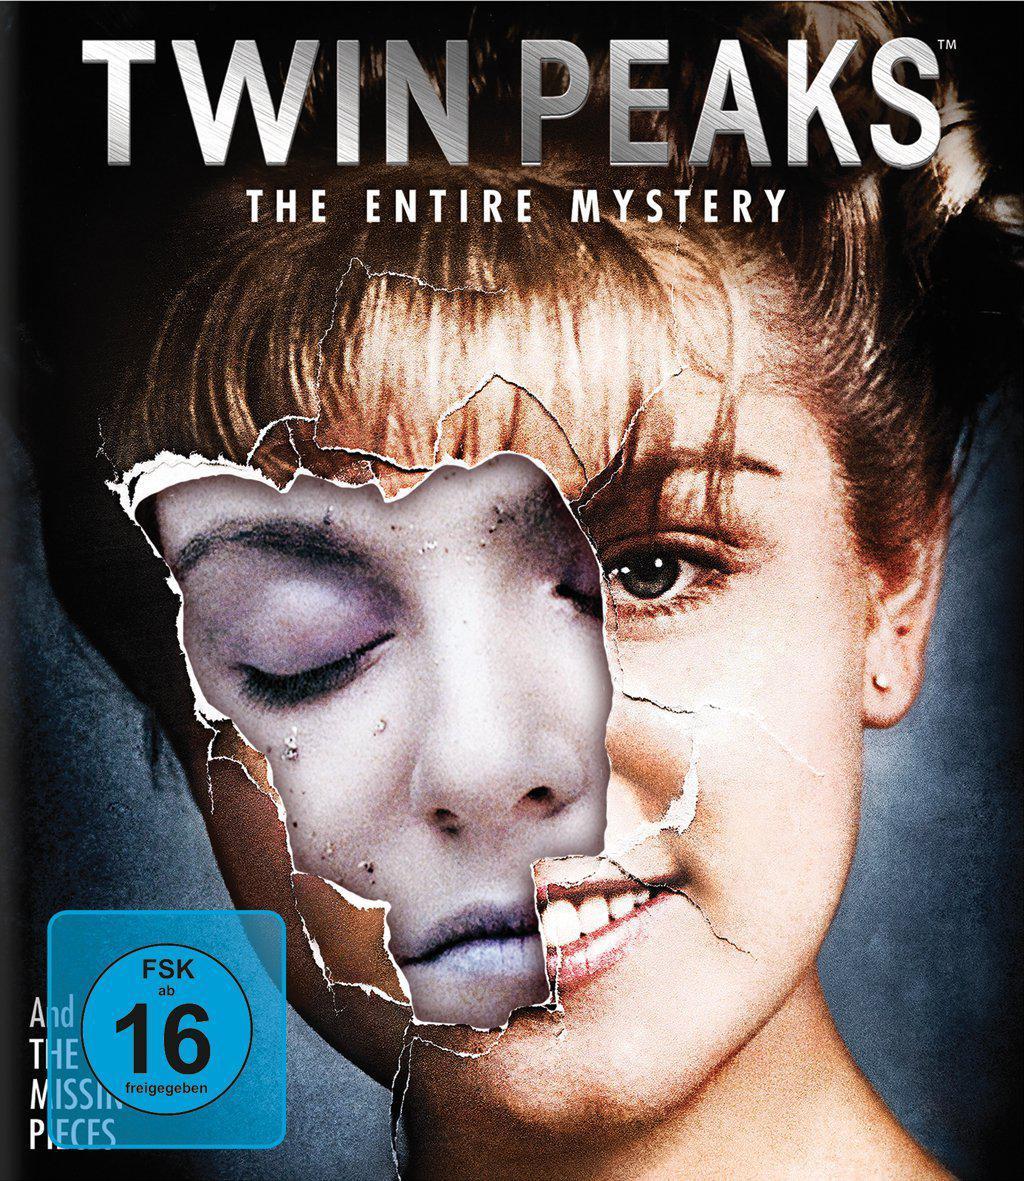 Coffret Blu-Ray Twin Peaks The Entire Mystery (Intégrale série + film + bonus)